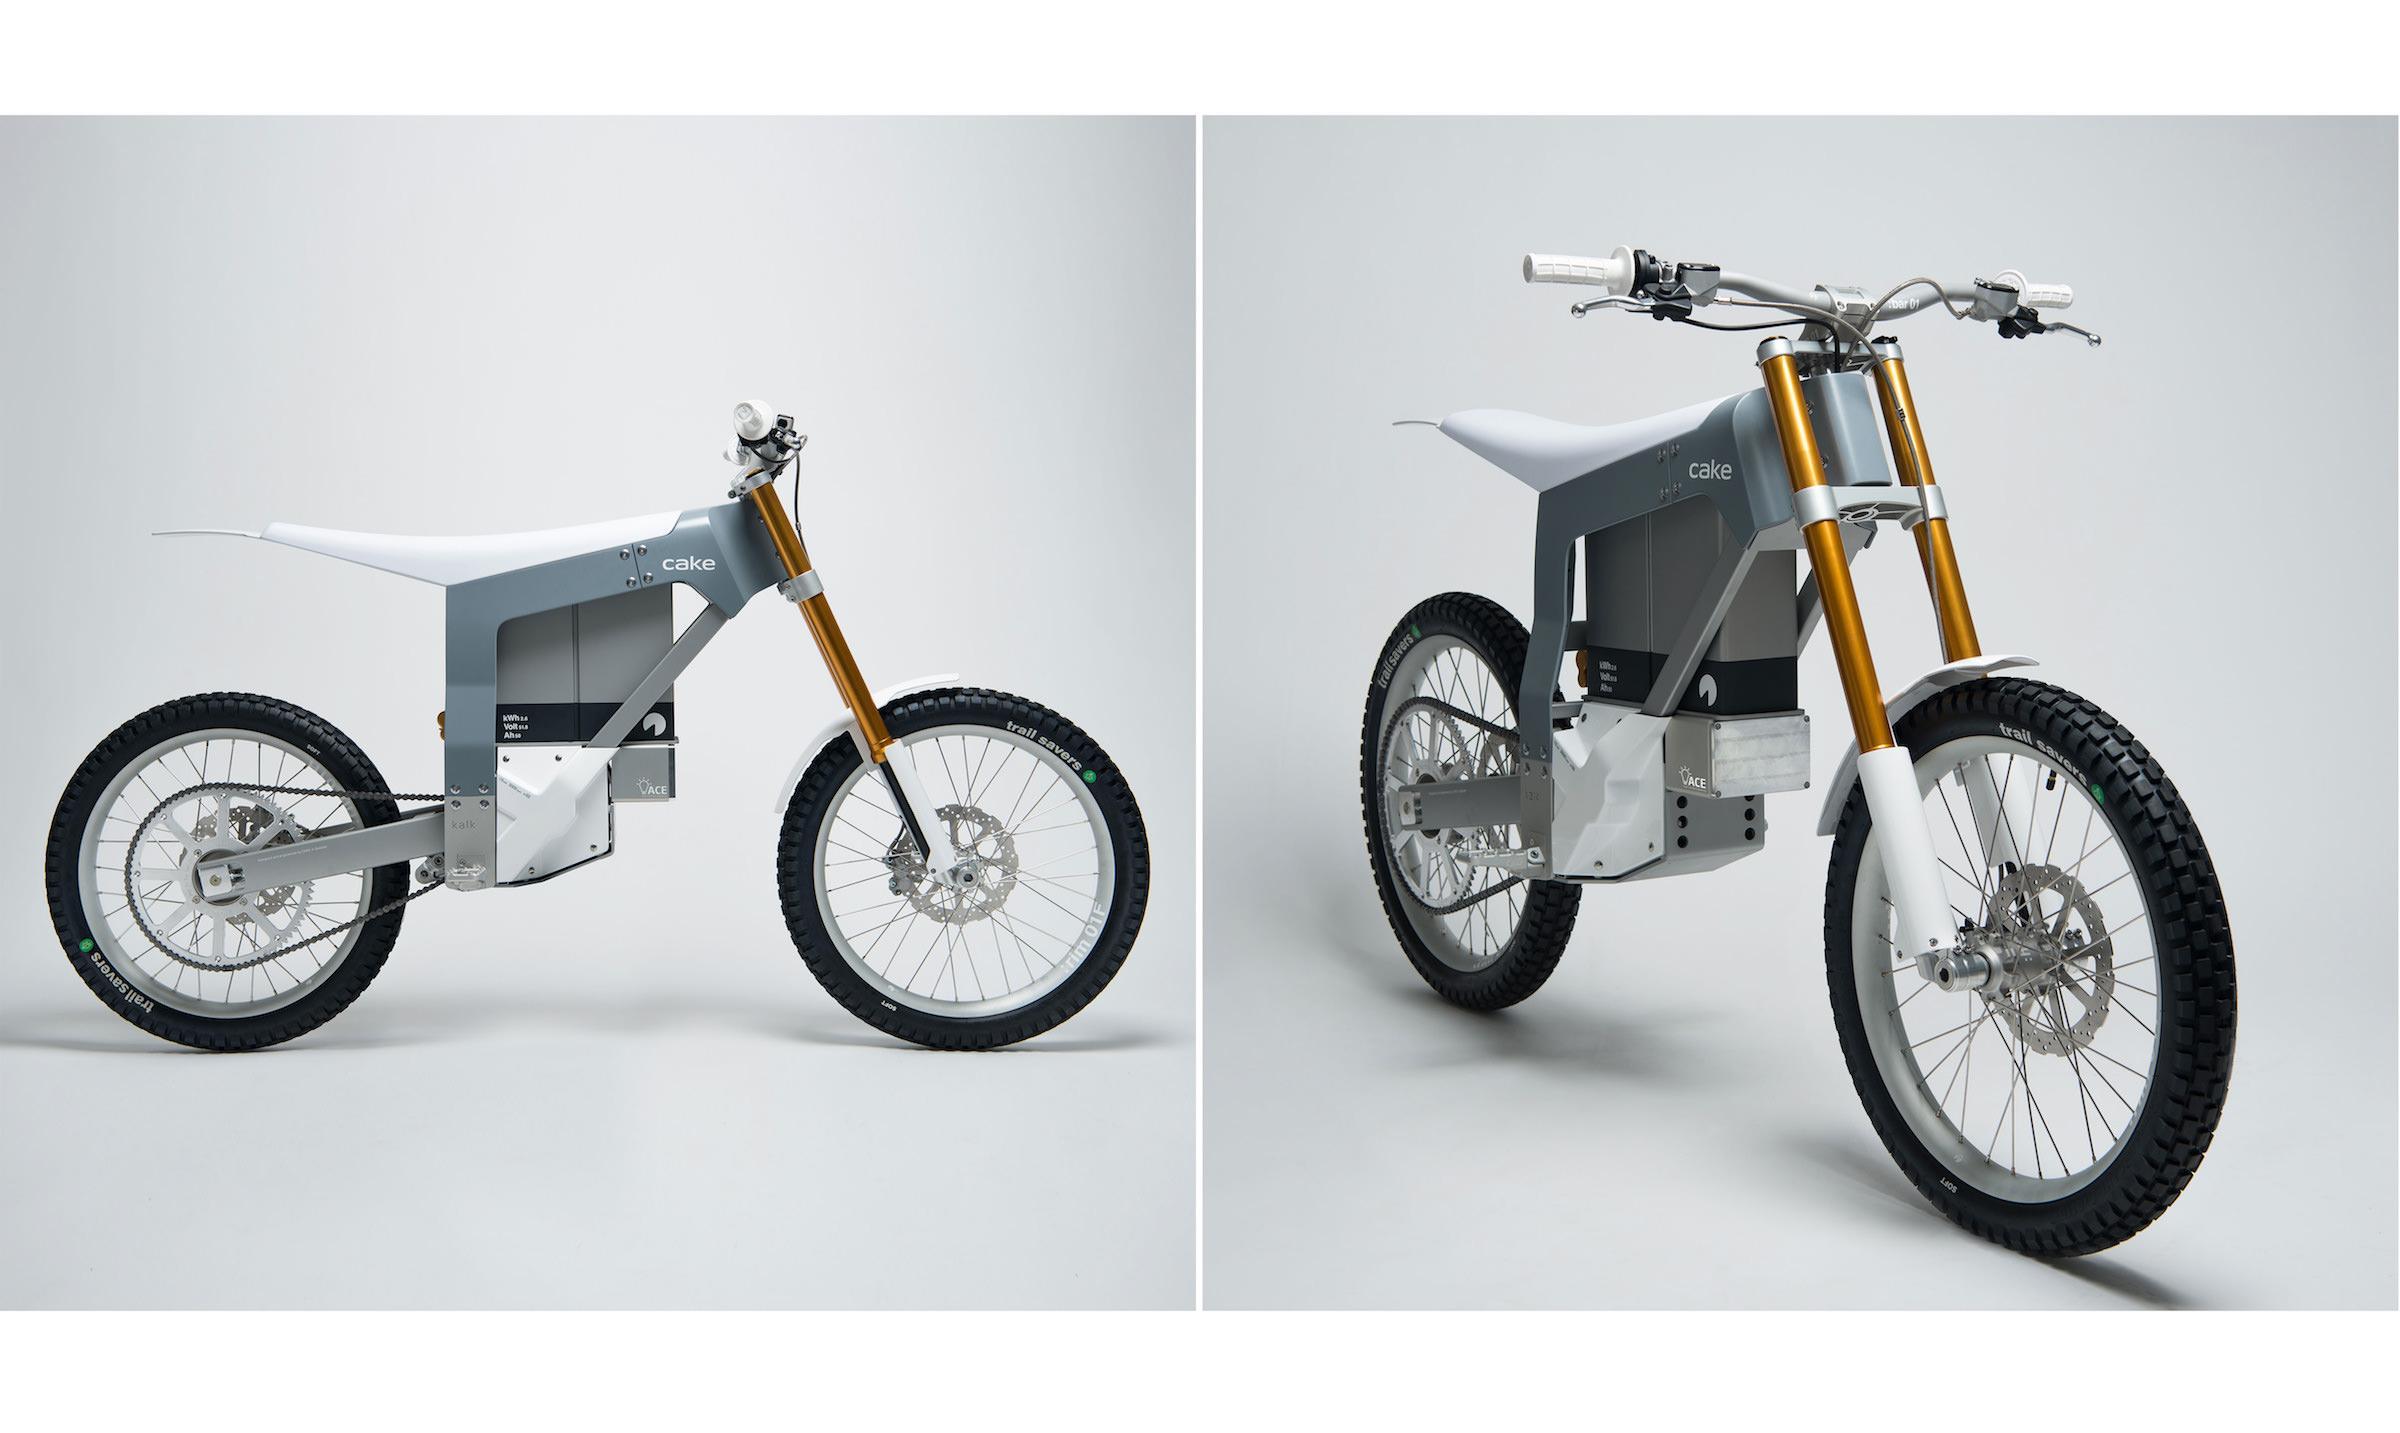 a two wheeled tesla the cake kalk electric bike. Black Bedroom Furniture Sets. Home Design Ideas